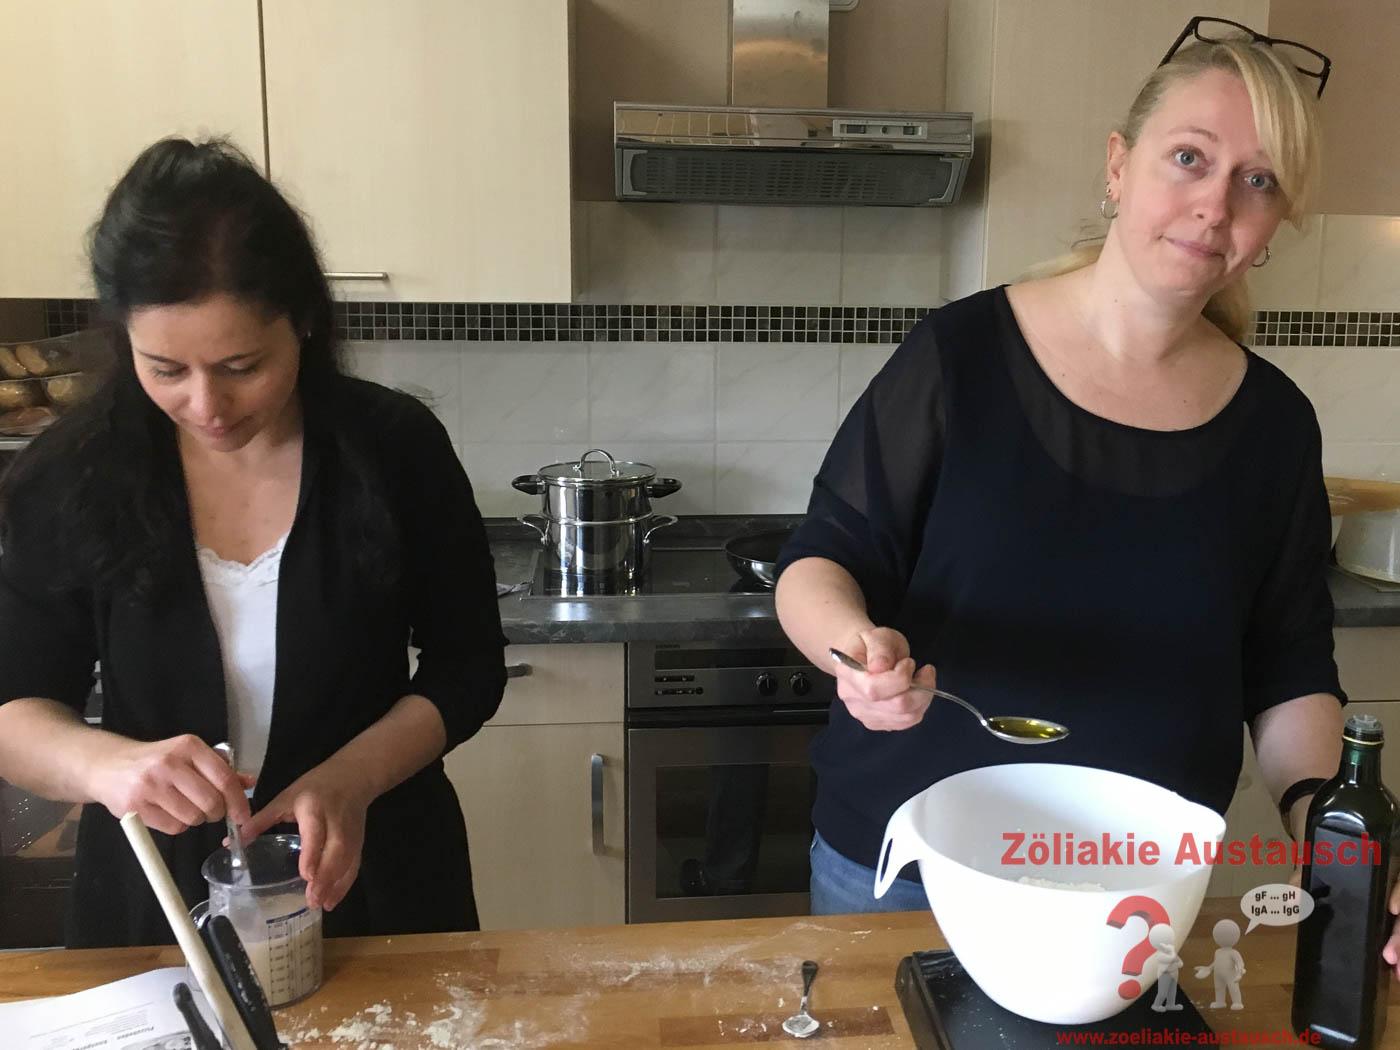 Zoeliakie_Austausch_Tanja_Gruber-Backkurs_2017-042